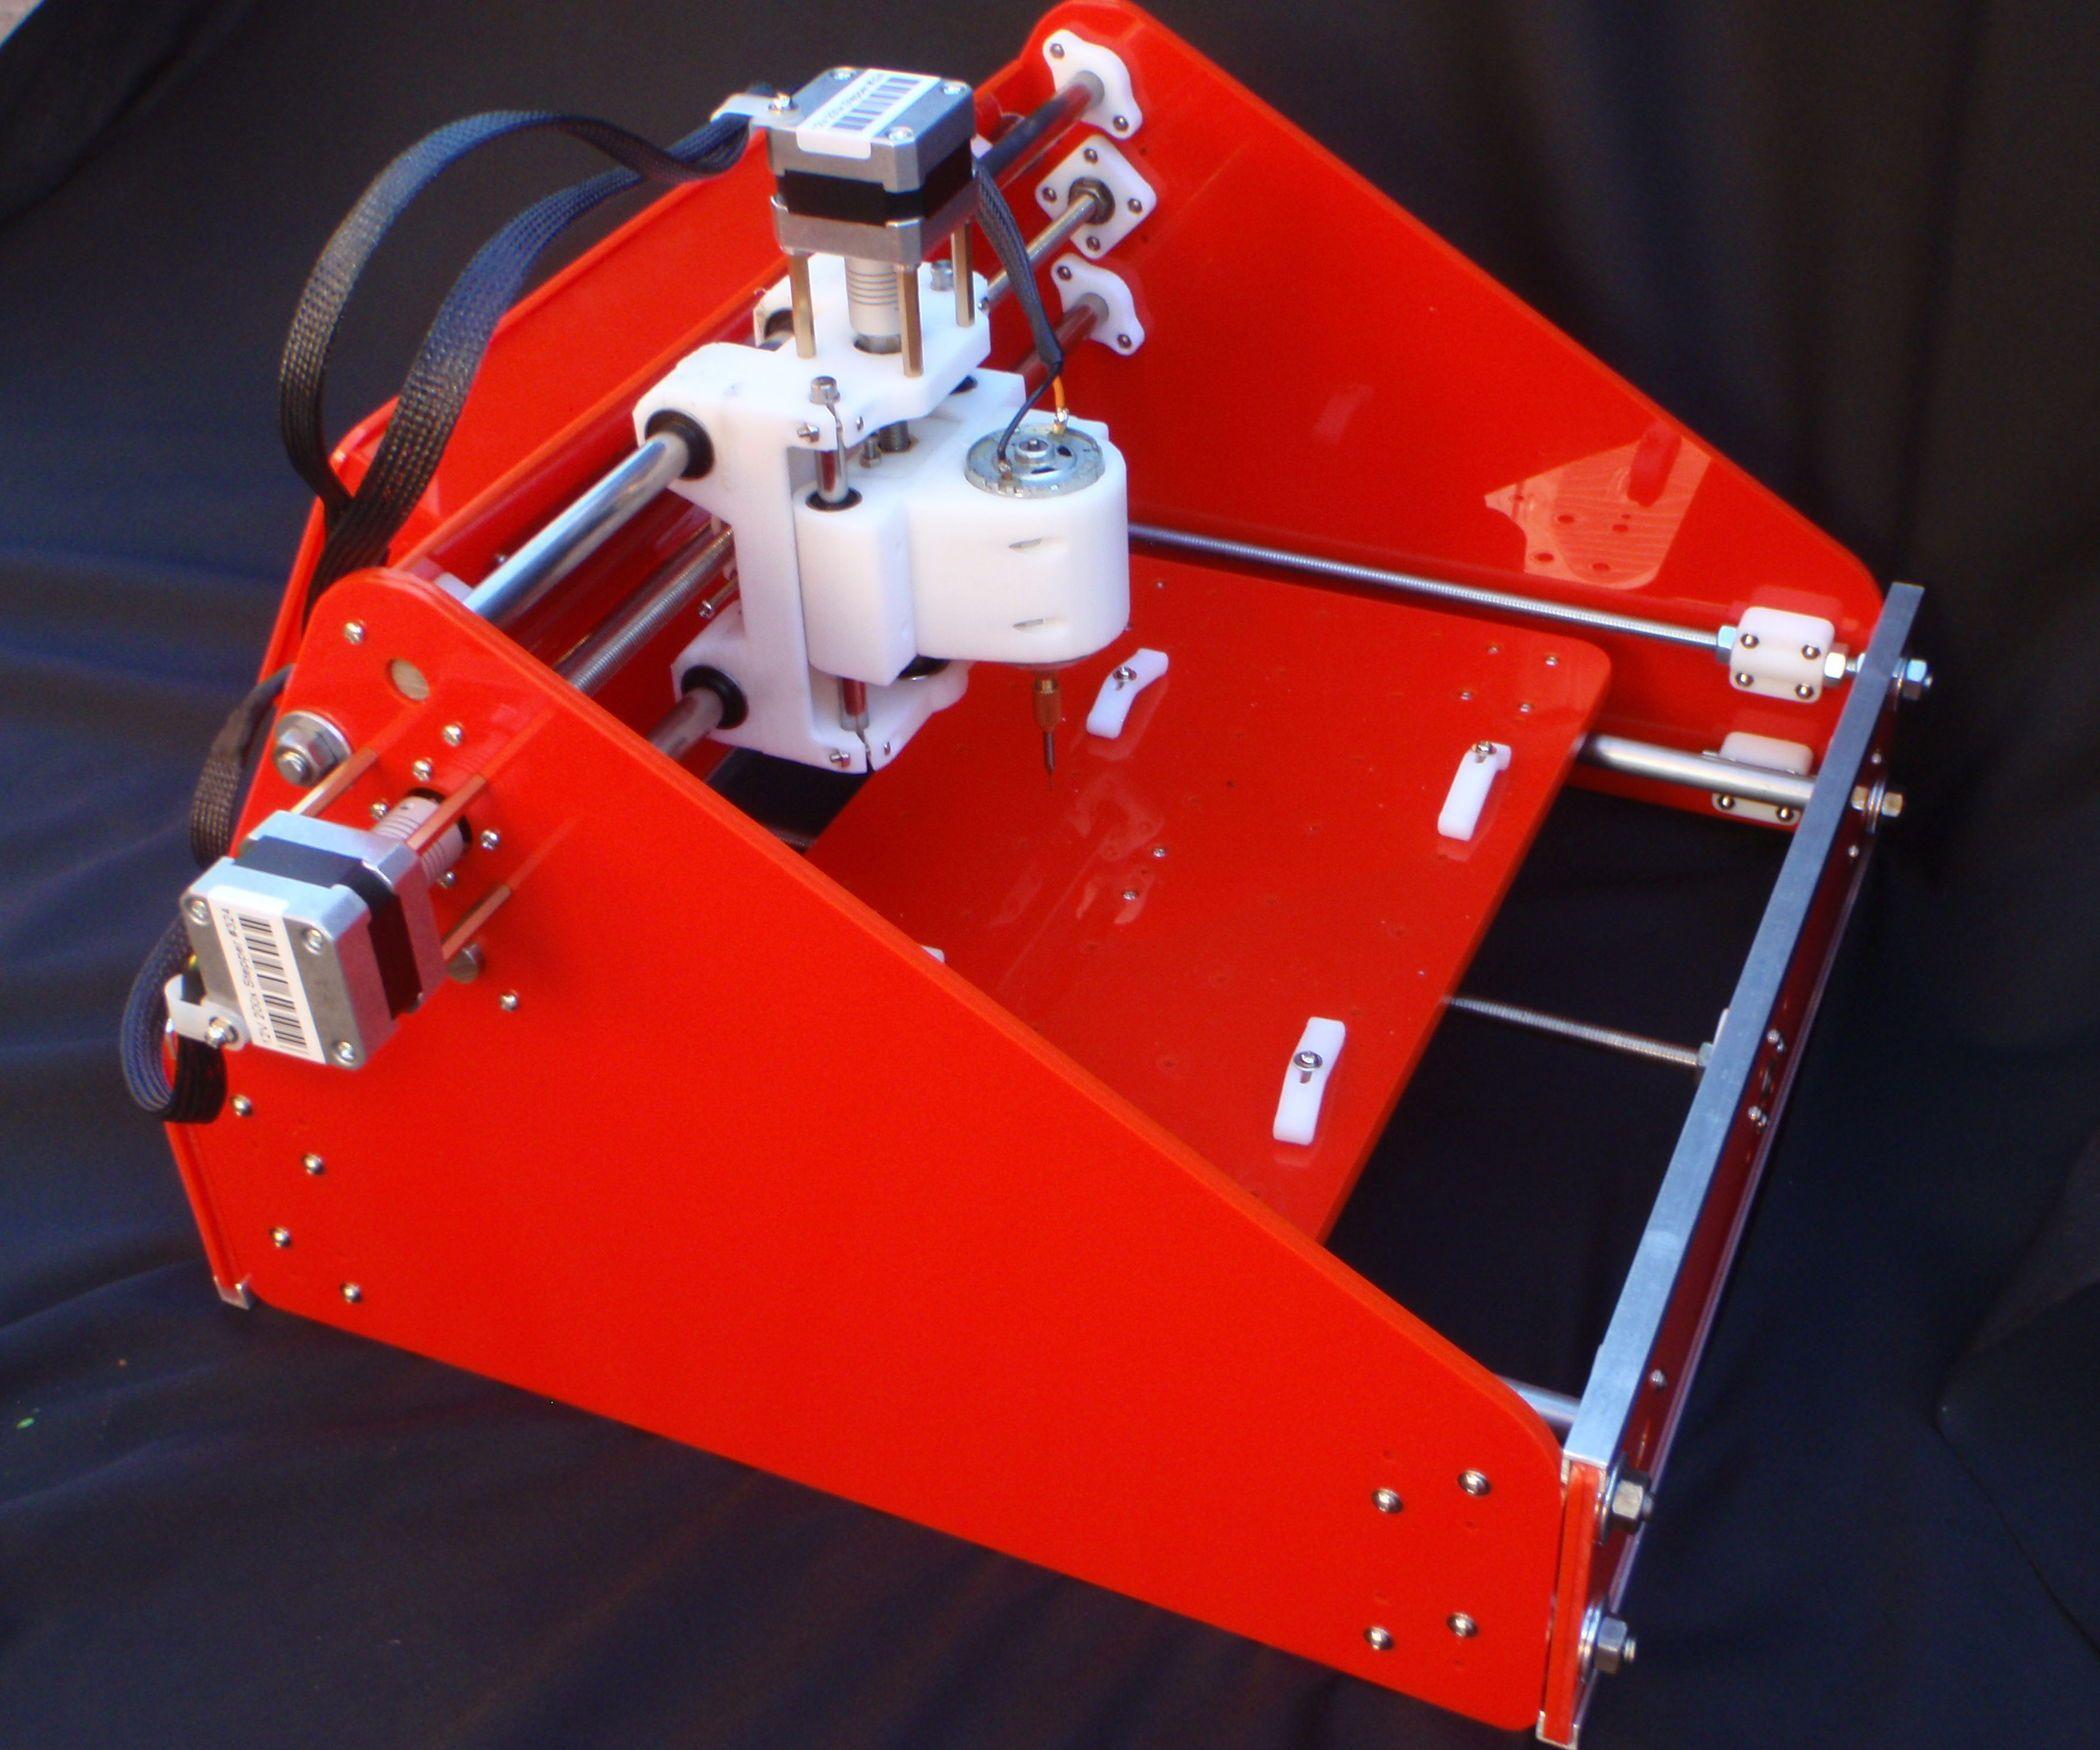 3D Printed CNC Mill Desktop cnc, Diy cnc router, Cnc